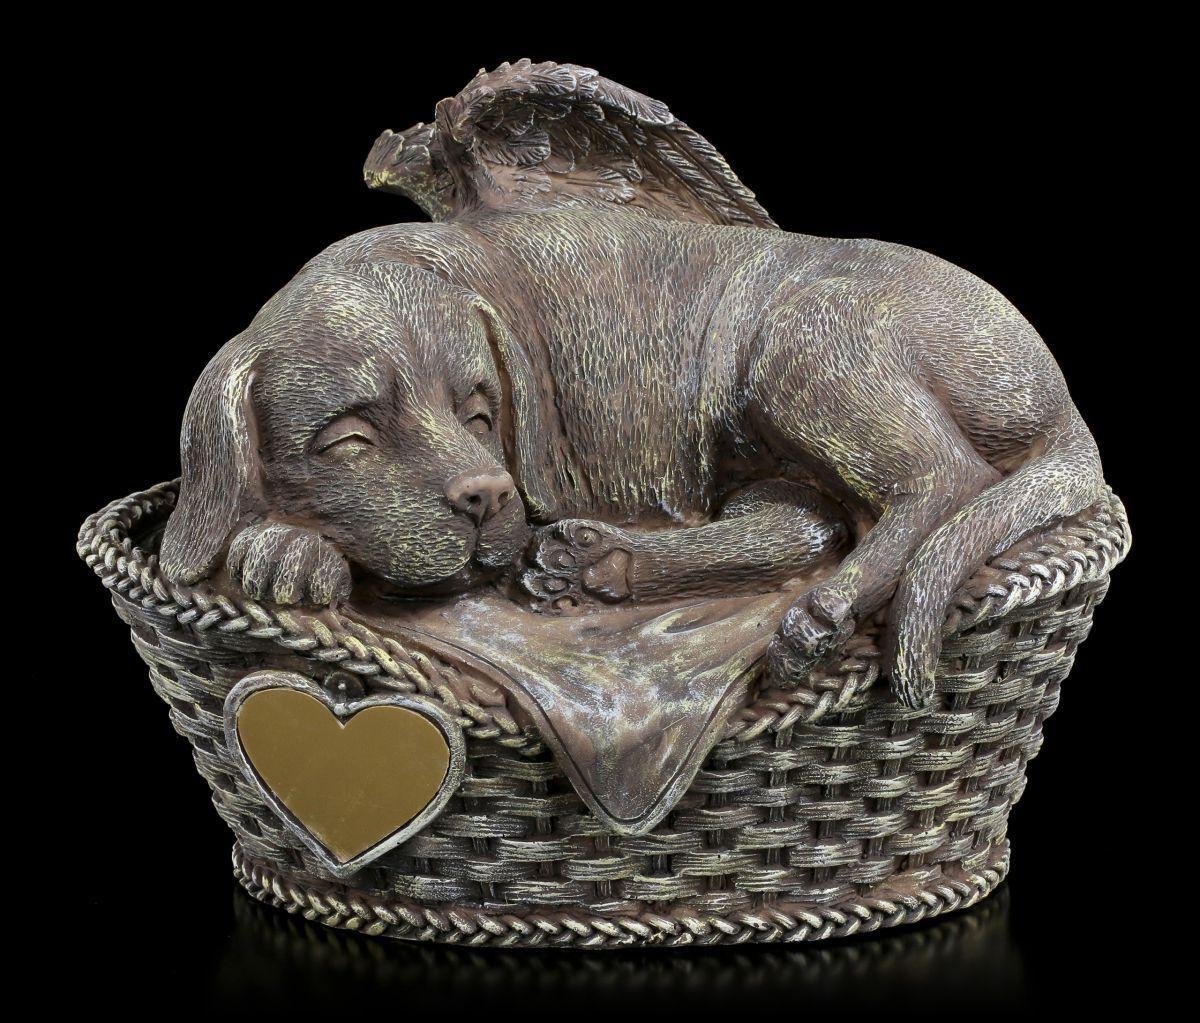 Tier Urne - Hunde-Engel mit Gravurplatte in Steinoptik - edle Hunde Urne Deko